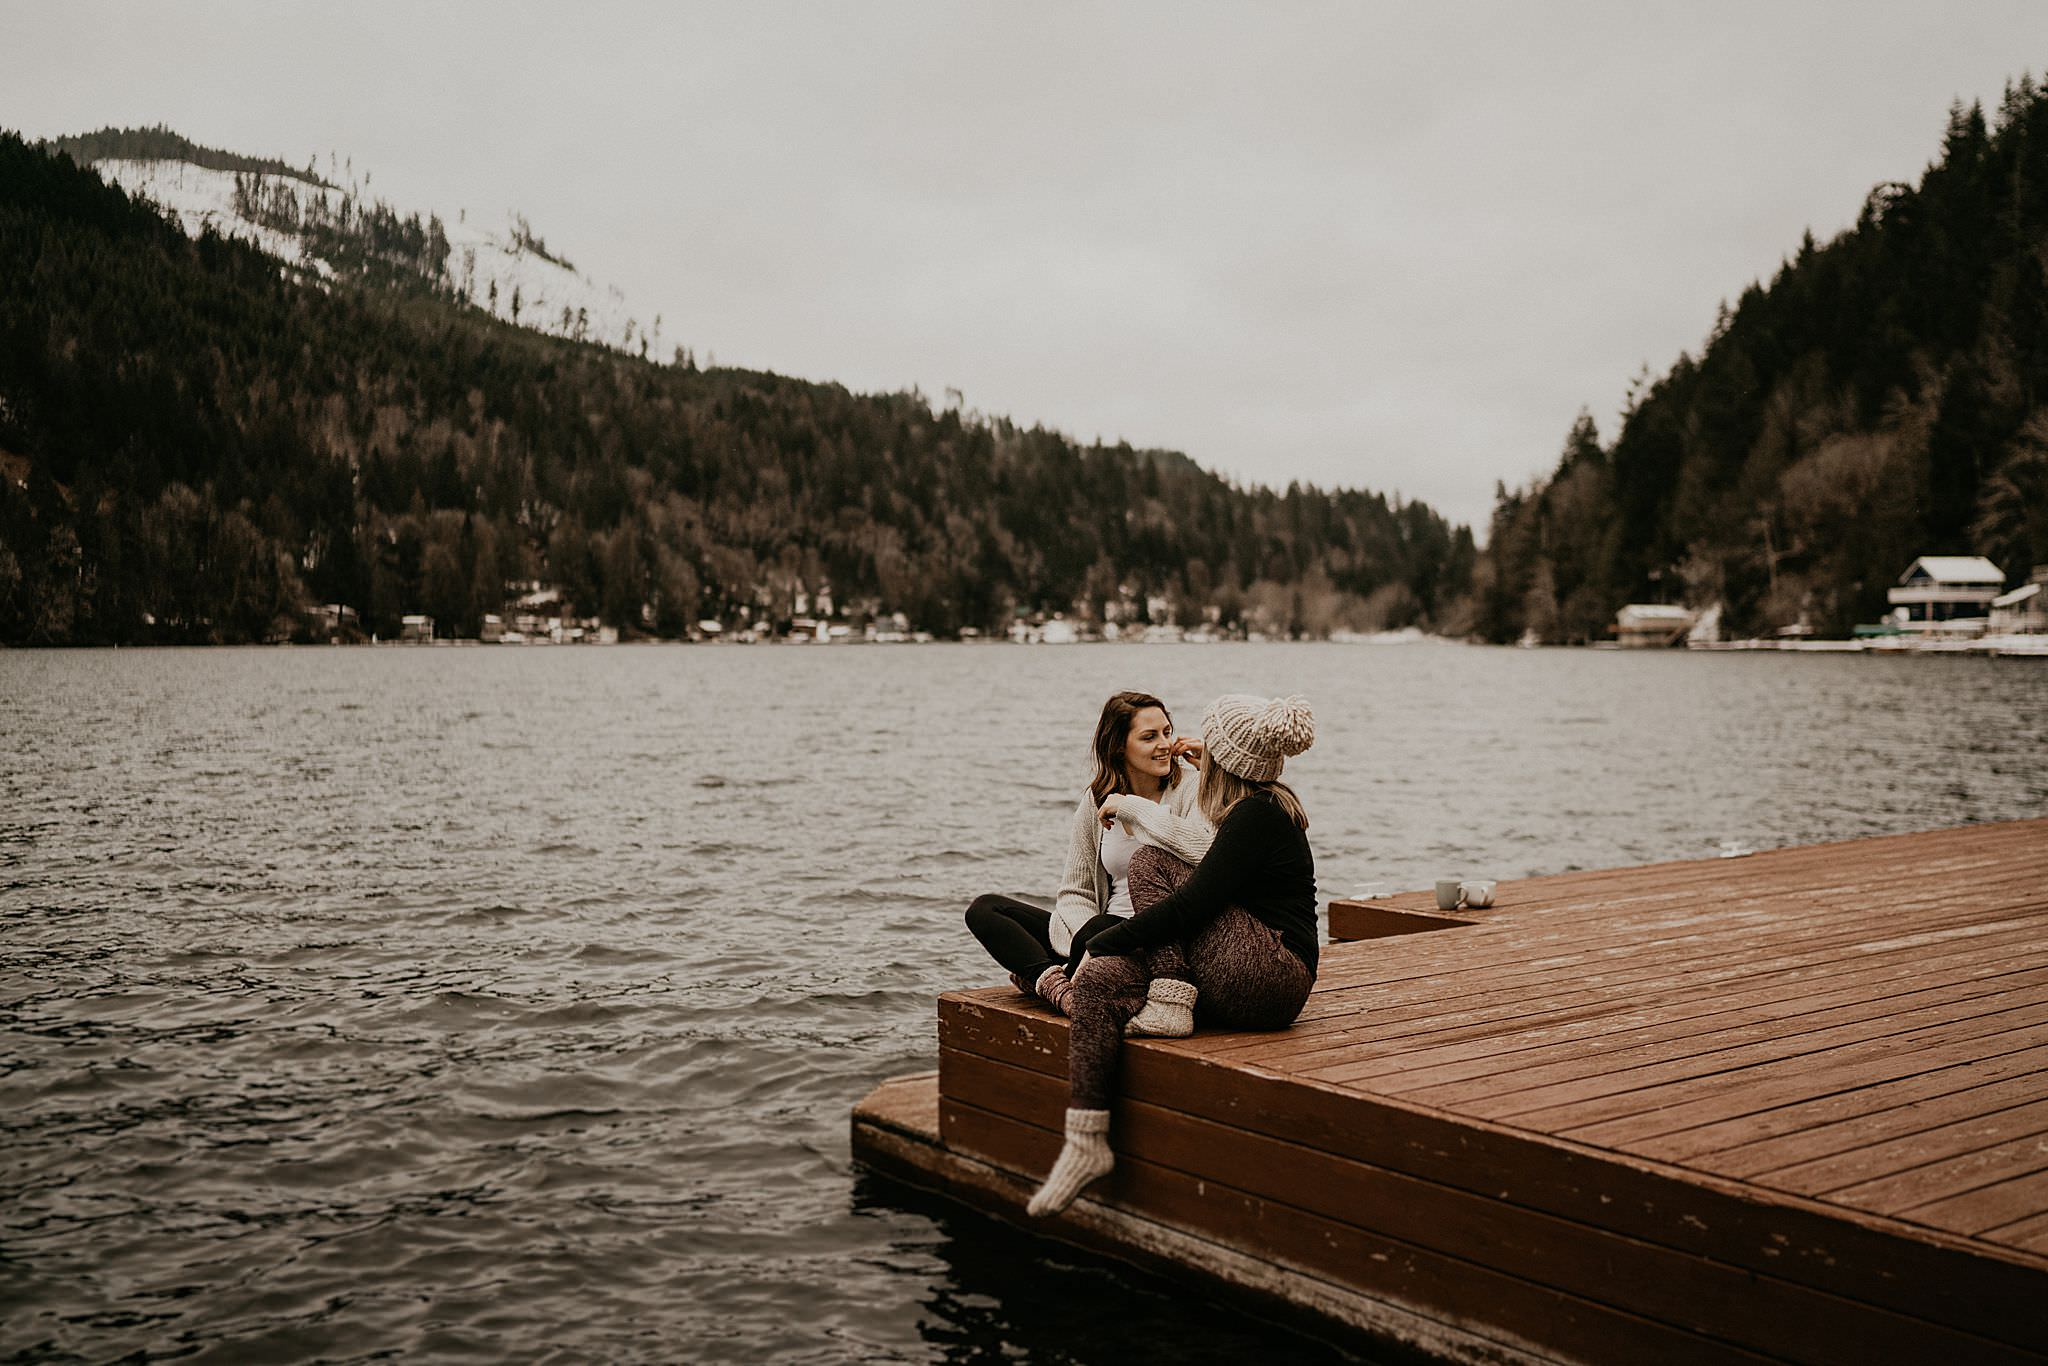 Port angeles olympic national park cabin on lake wedding